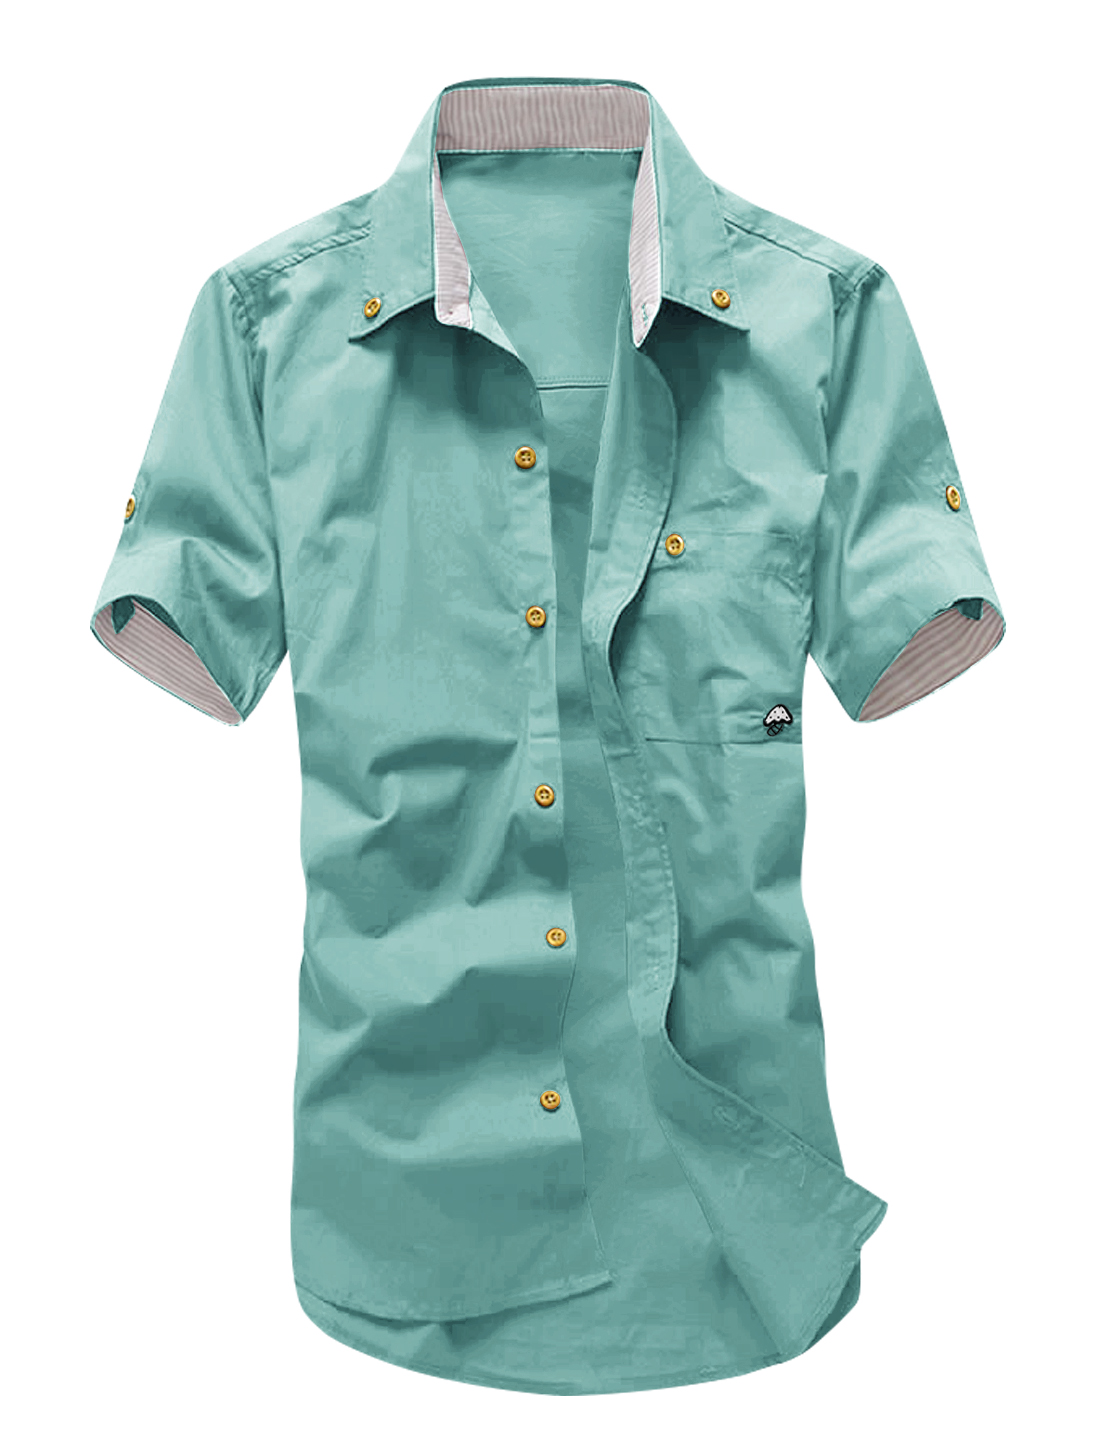 Man Short Sleeve Chest Pocket Button Down Shirt Dusty Green M